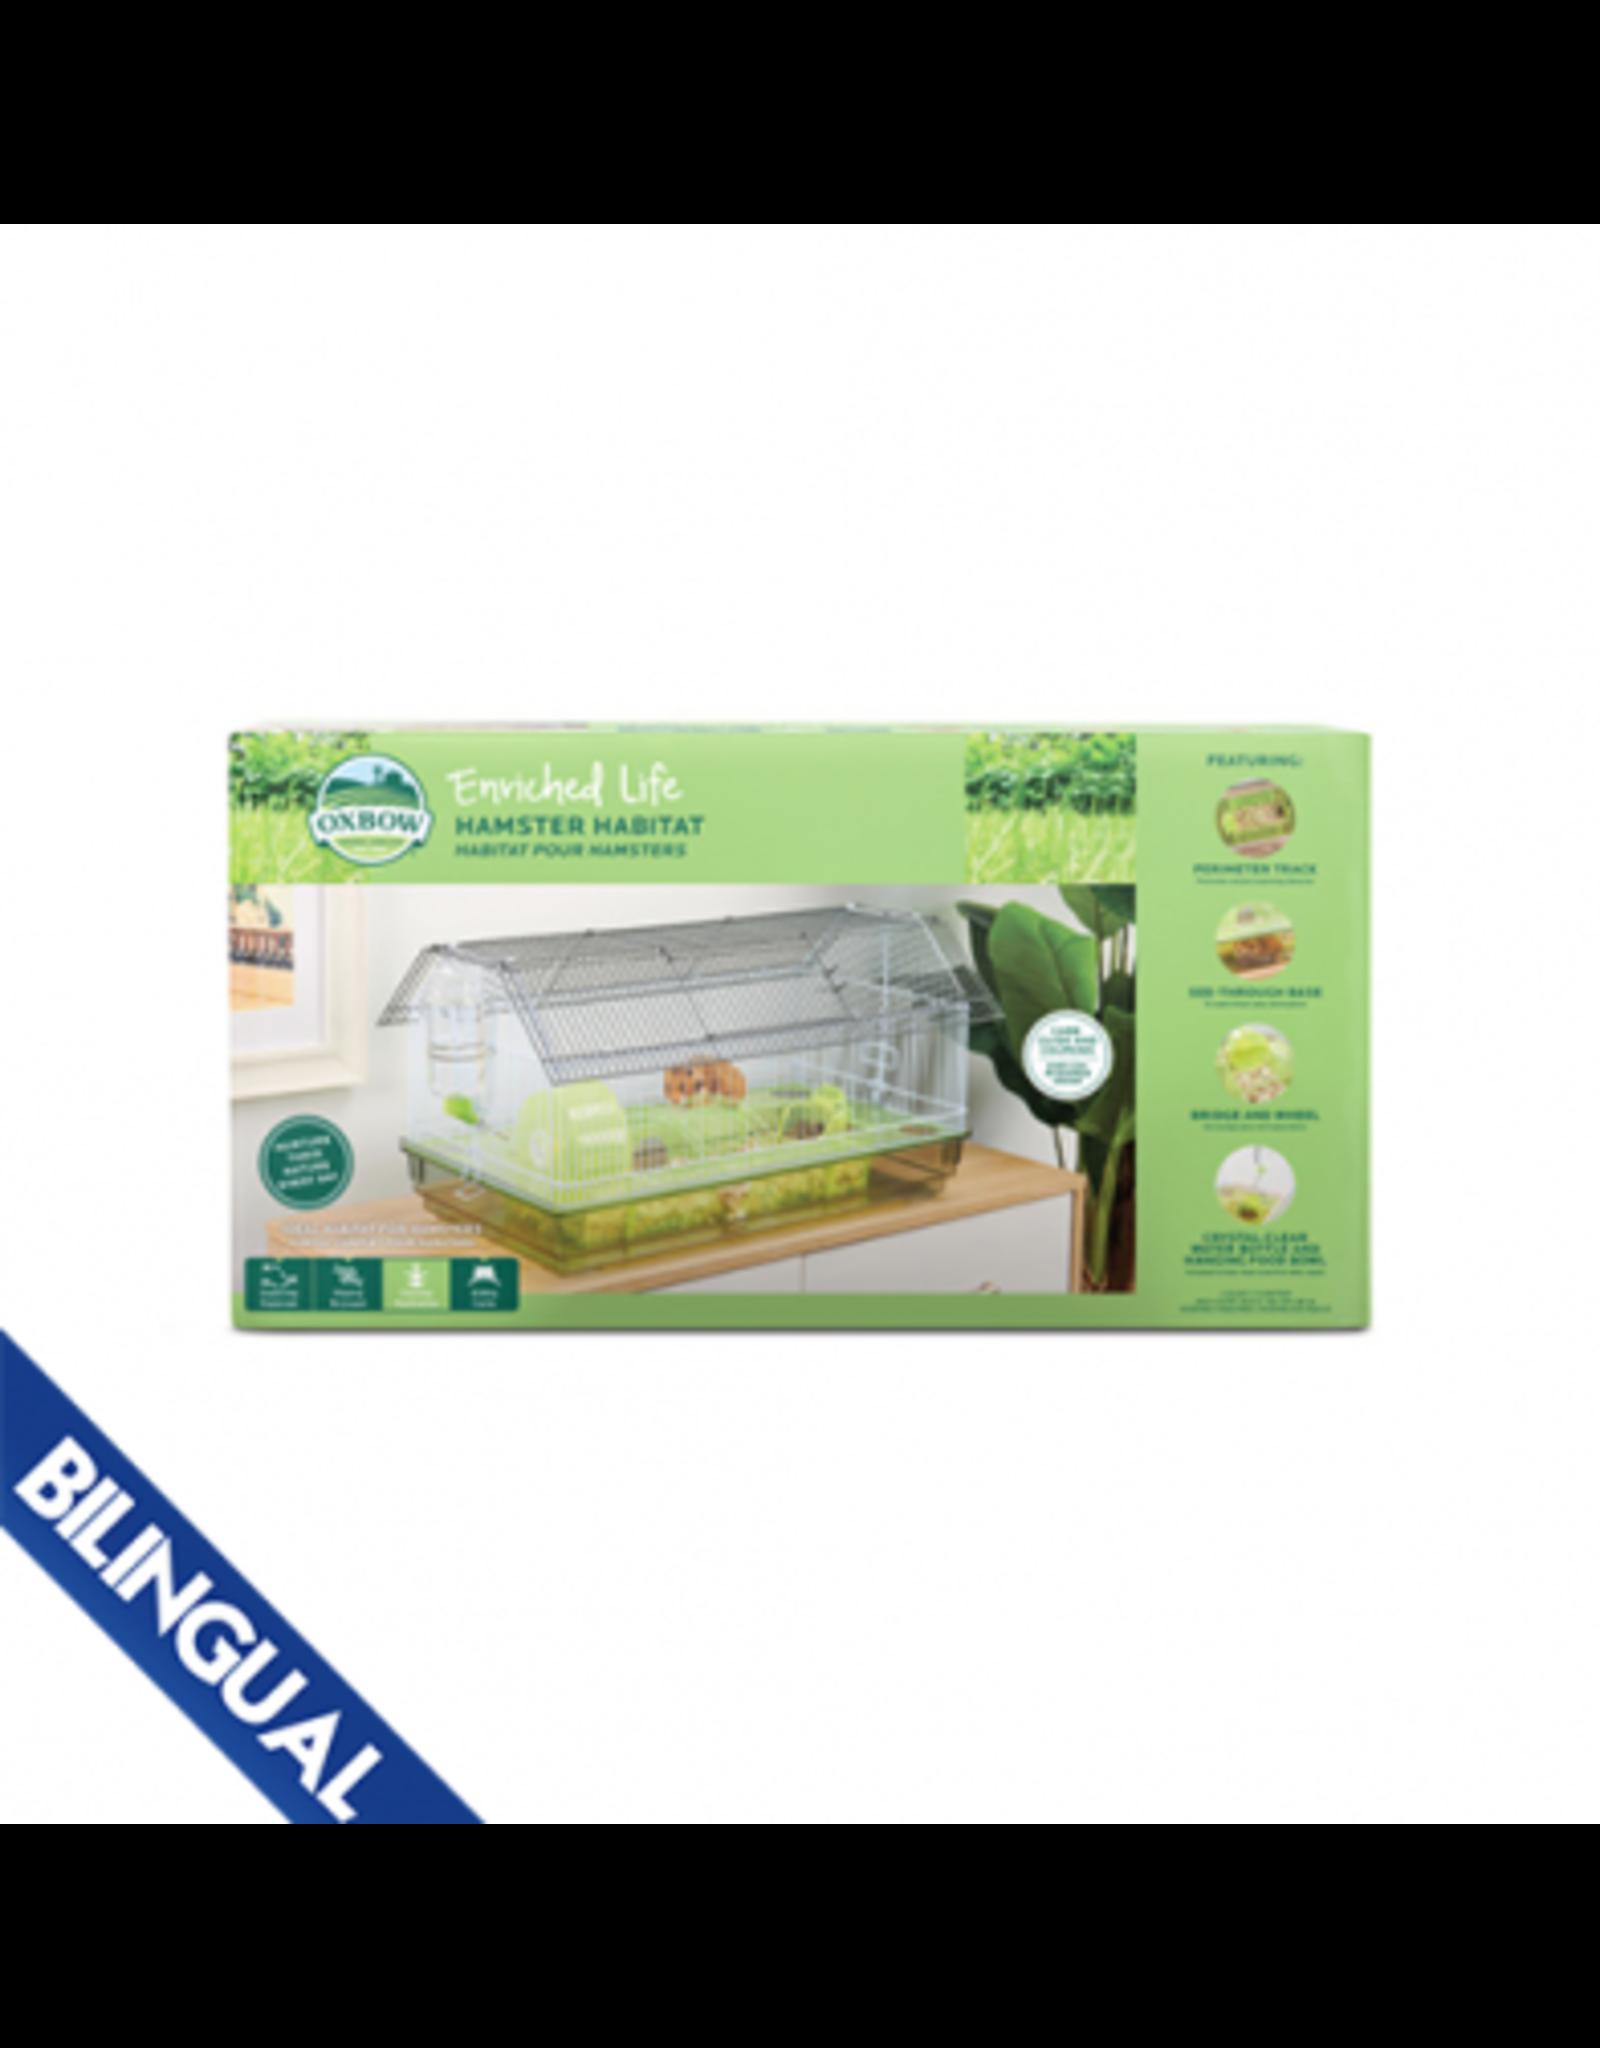 Oxbow OXBOW \ Enriched Life \ Hamster Habitat